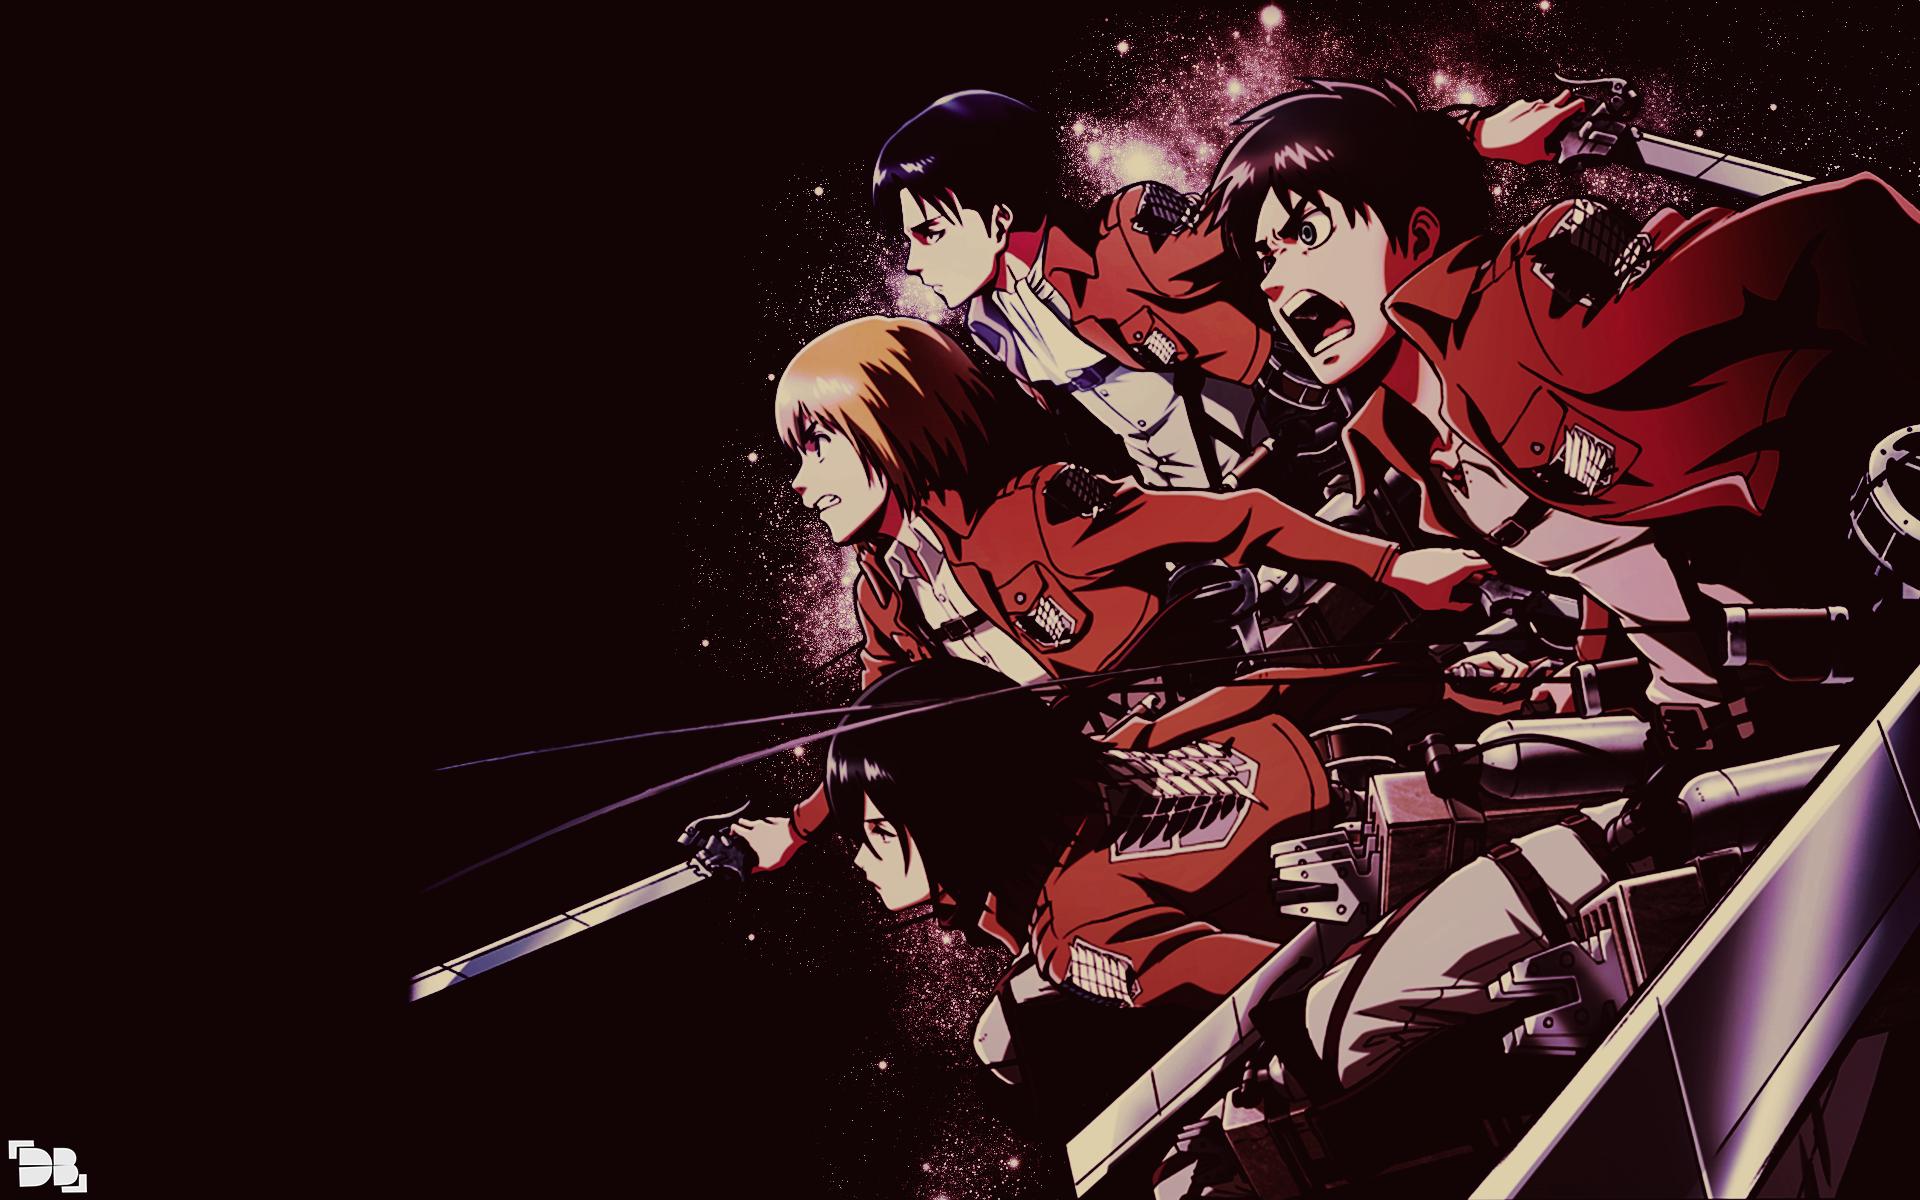 Shingeki no Kyojin Wallpaper 3 by DeathB00K 1920x1200